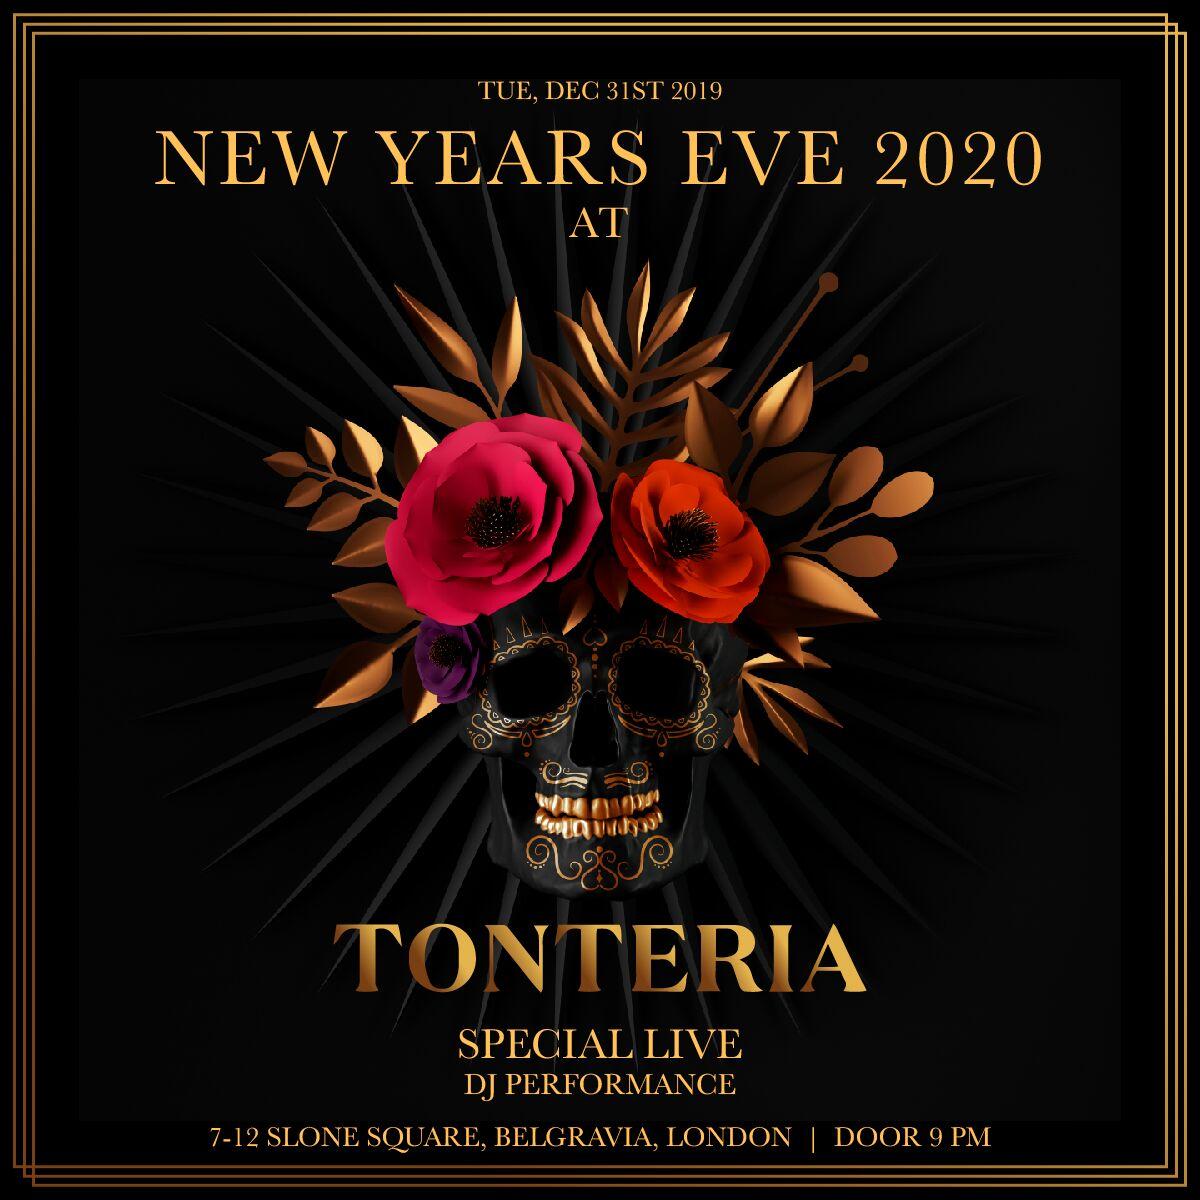 Tonteria New Years Eve